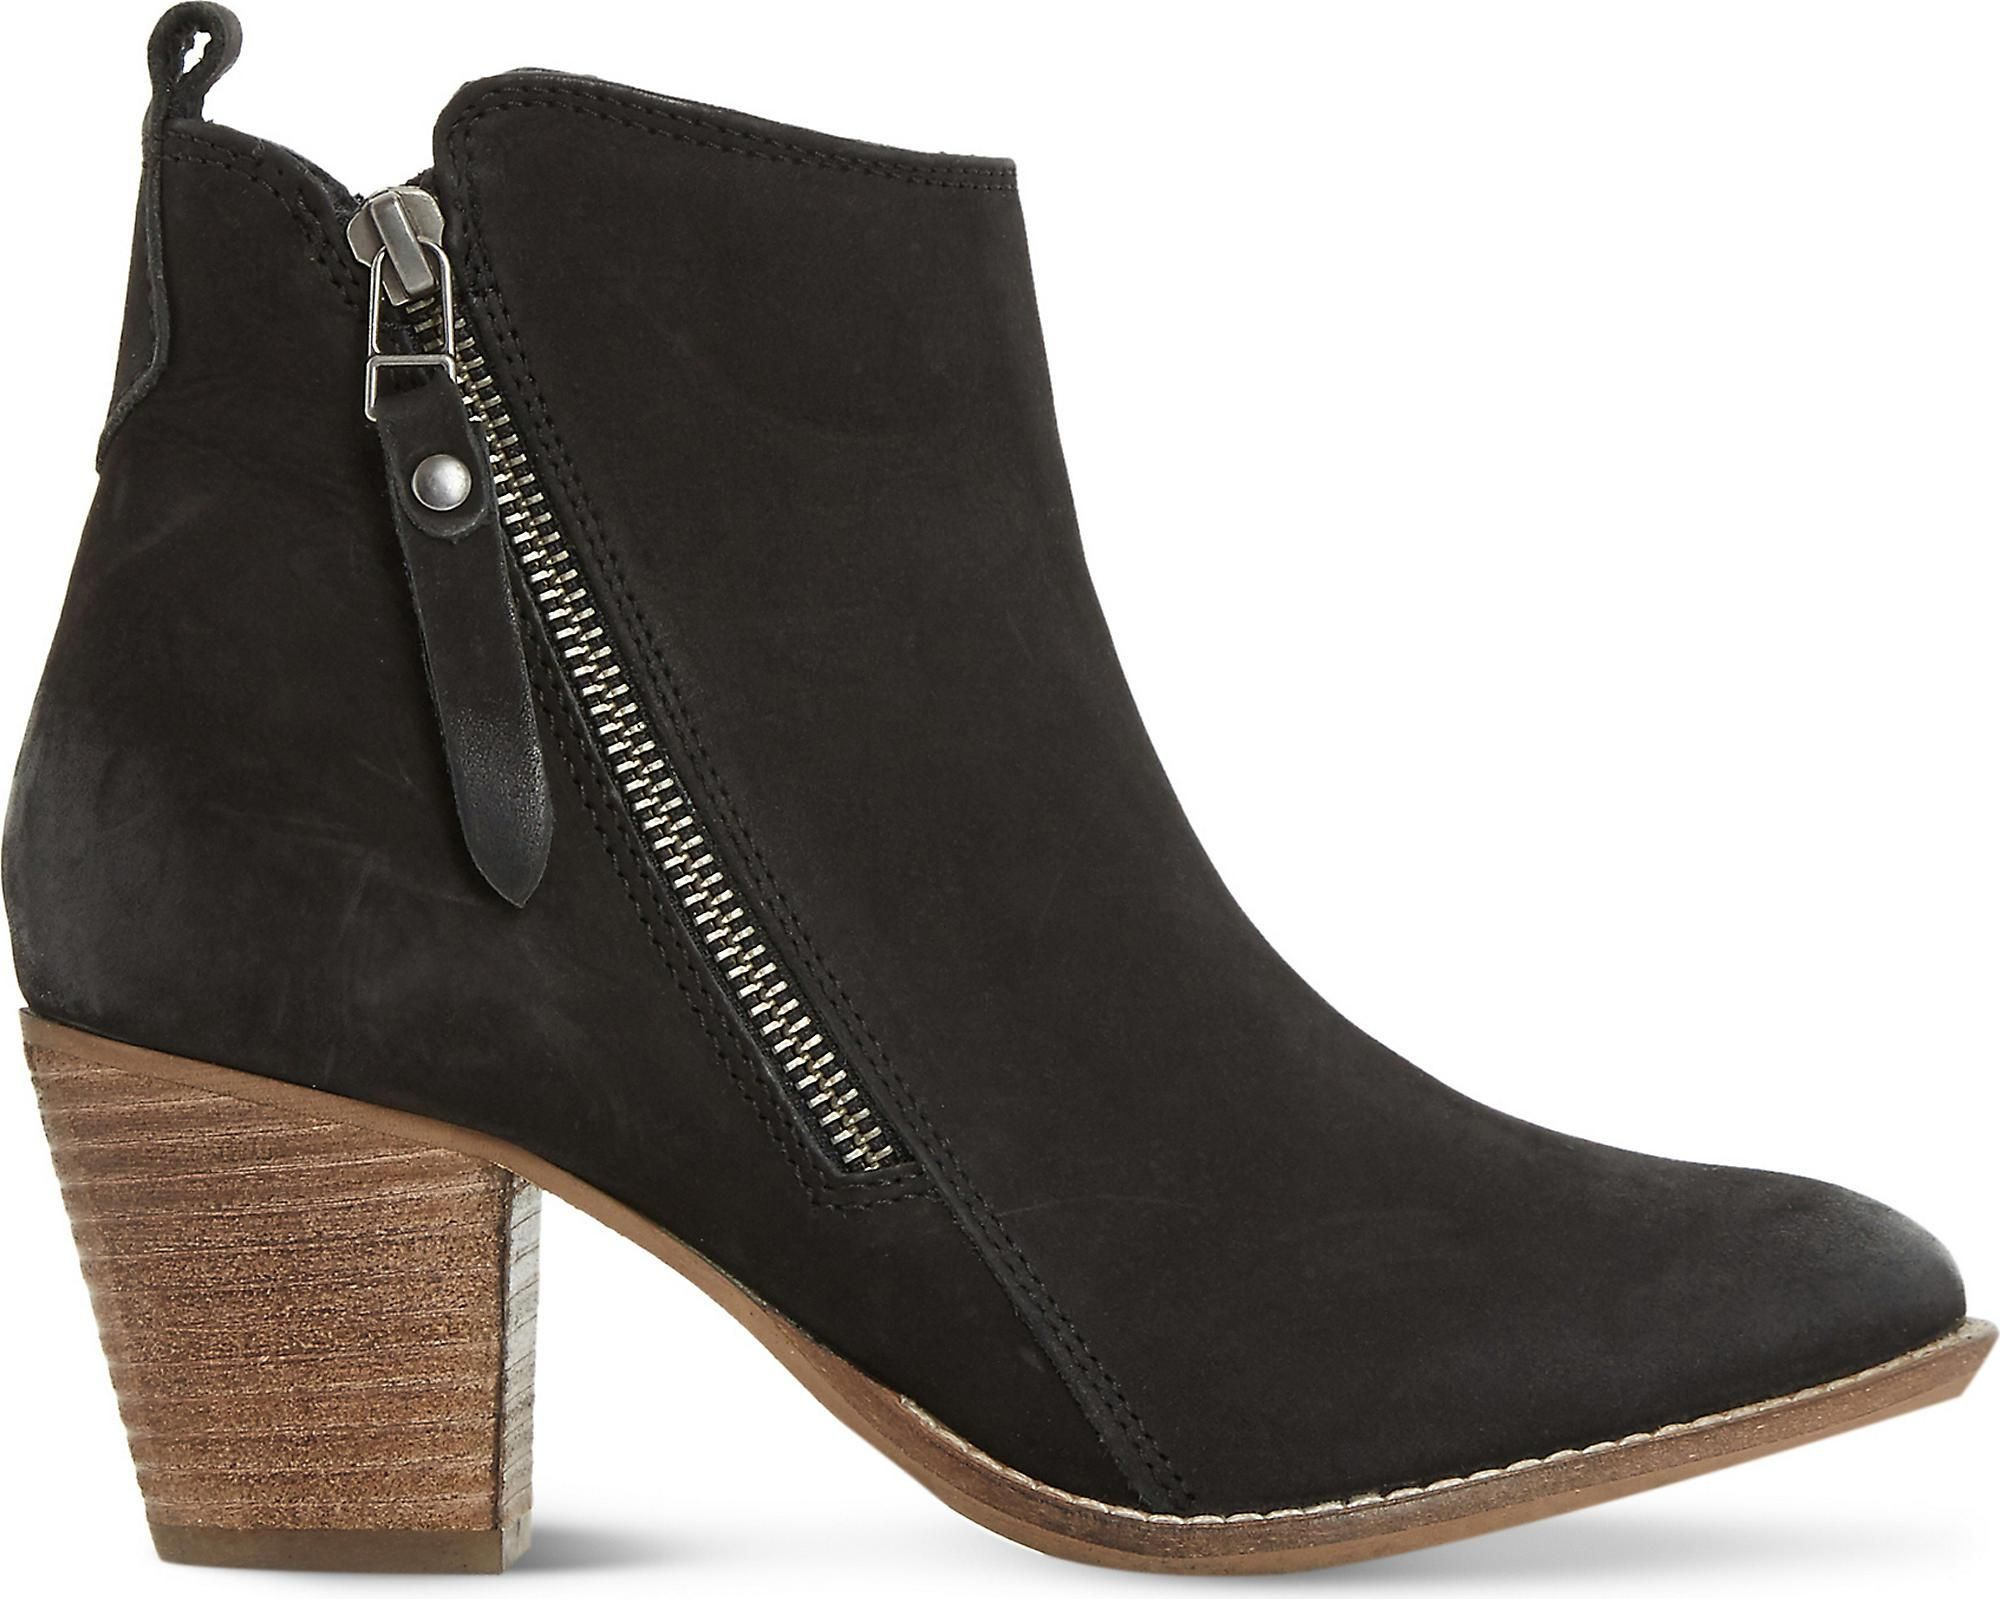 Dune Black Pontoon Leather Ankle Boots